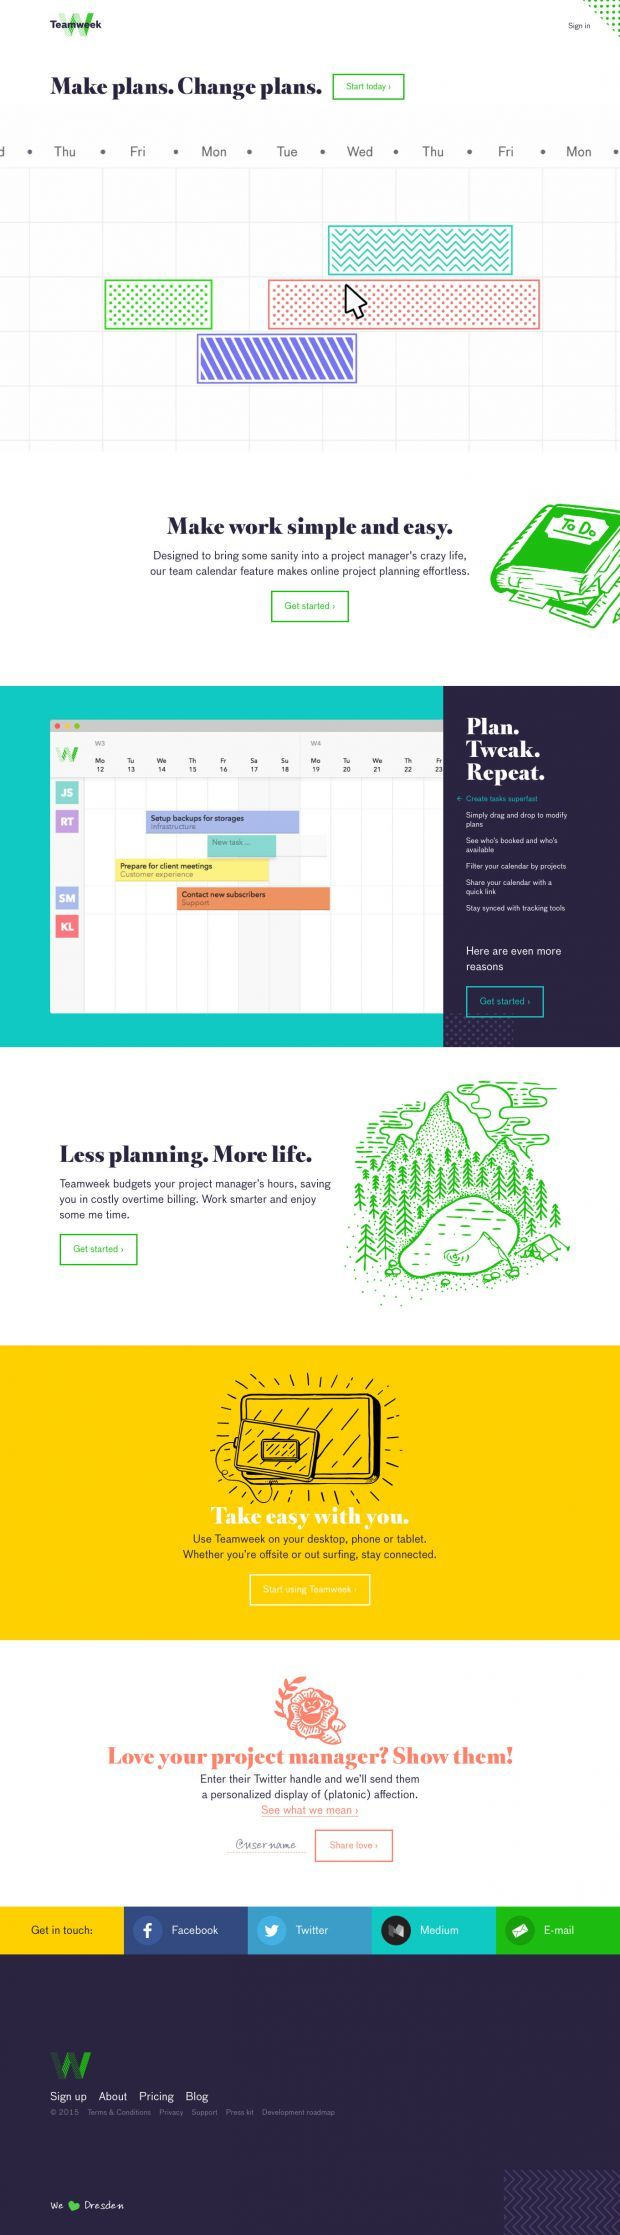 teamweek is the easiest online project planner with team calendar